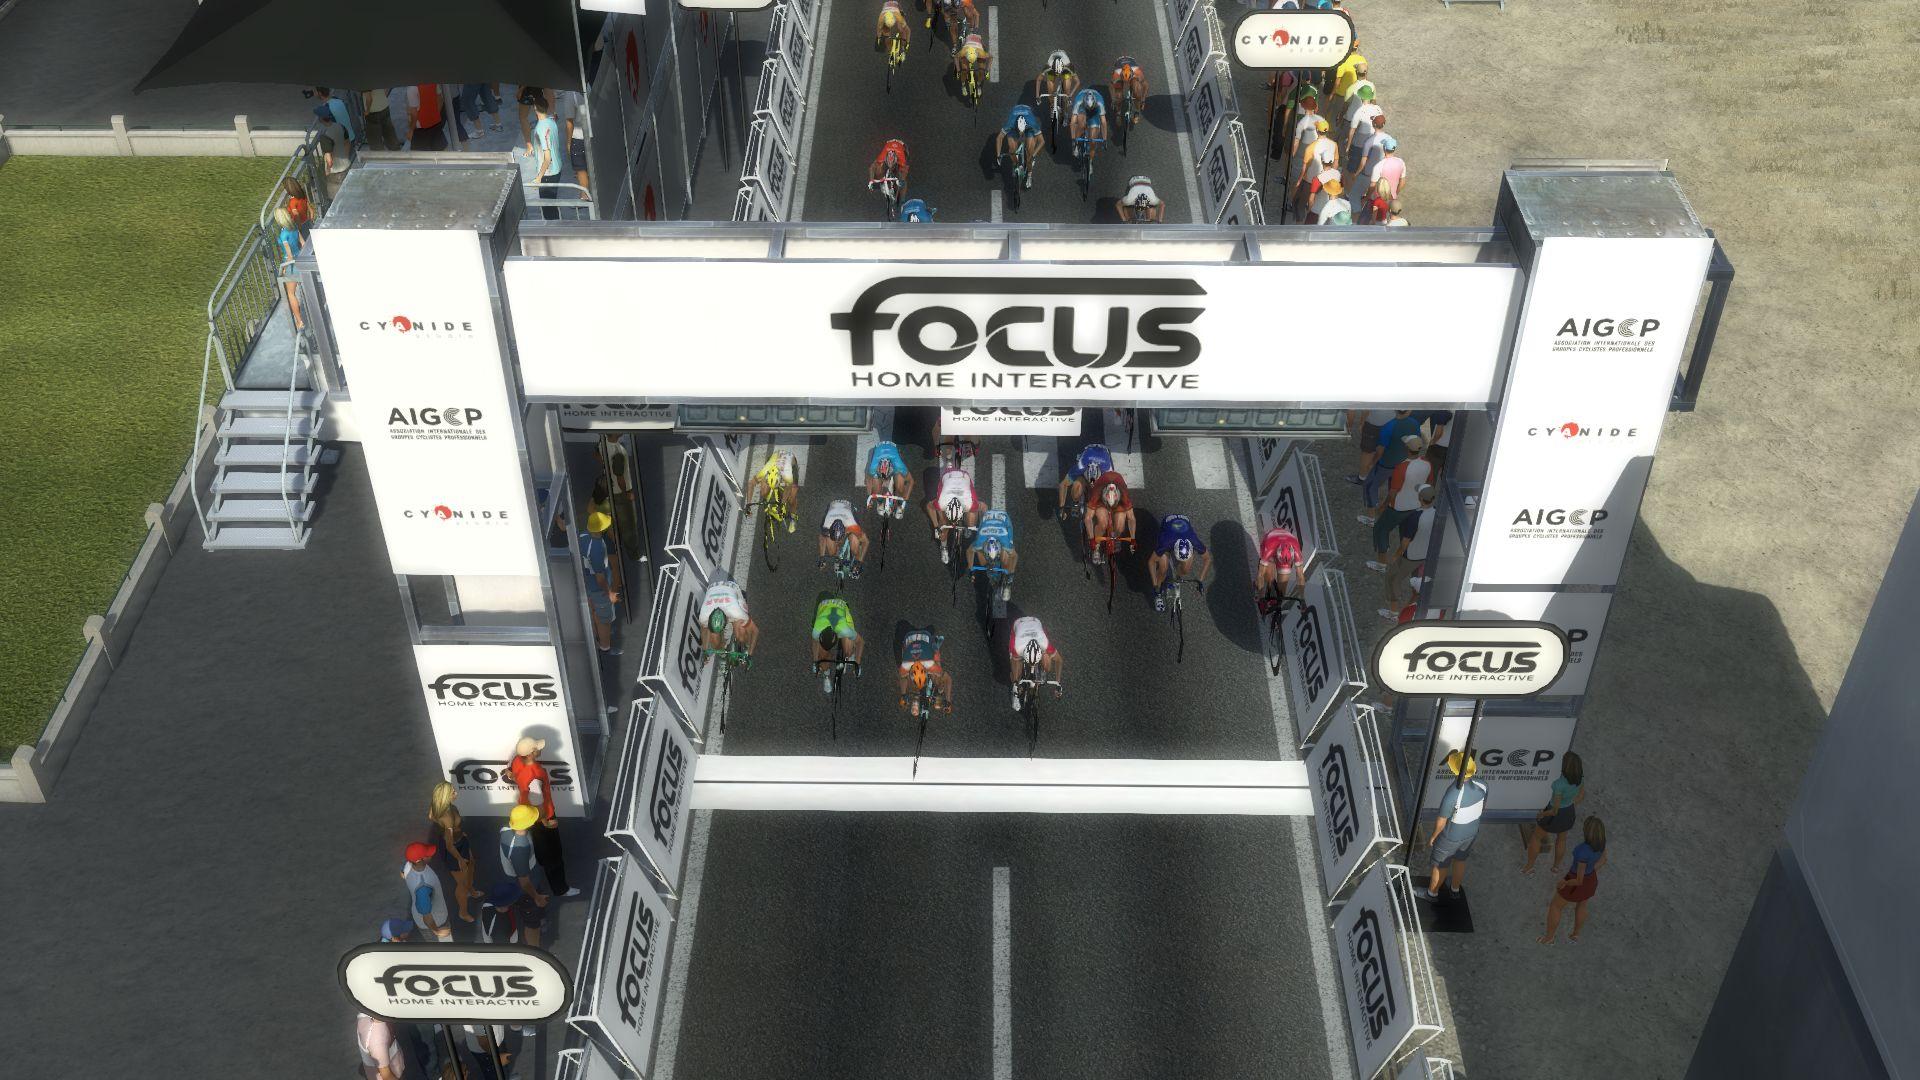 pcmdaily.com/images/mg/2019/Races/PT/Qatar/mg19_qat_s01_19.jpg